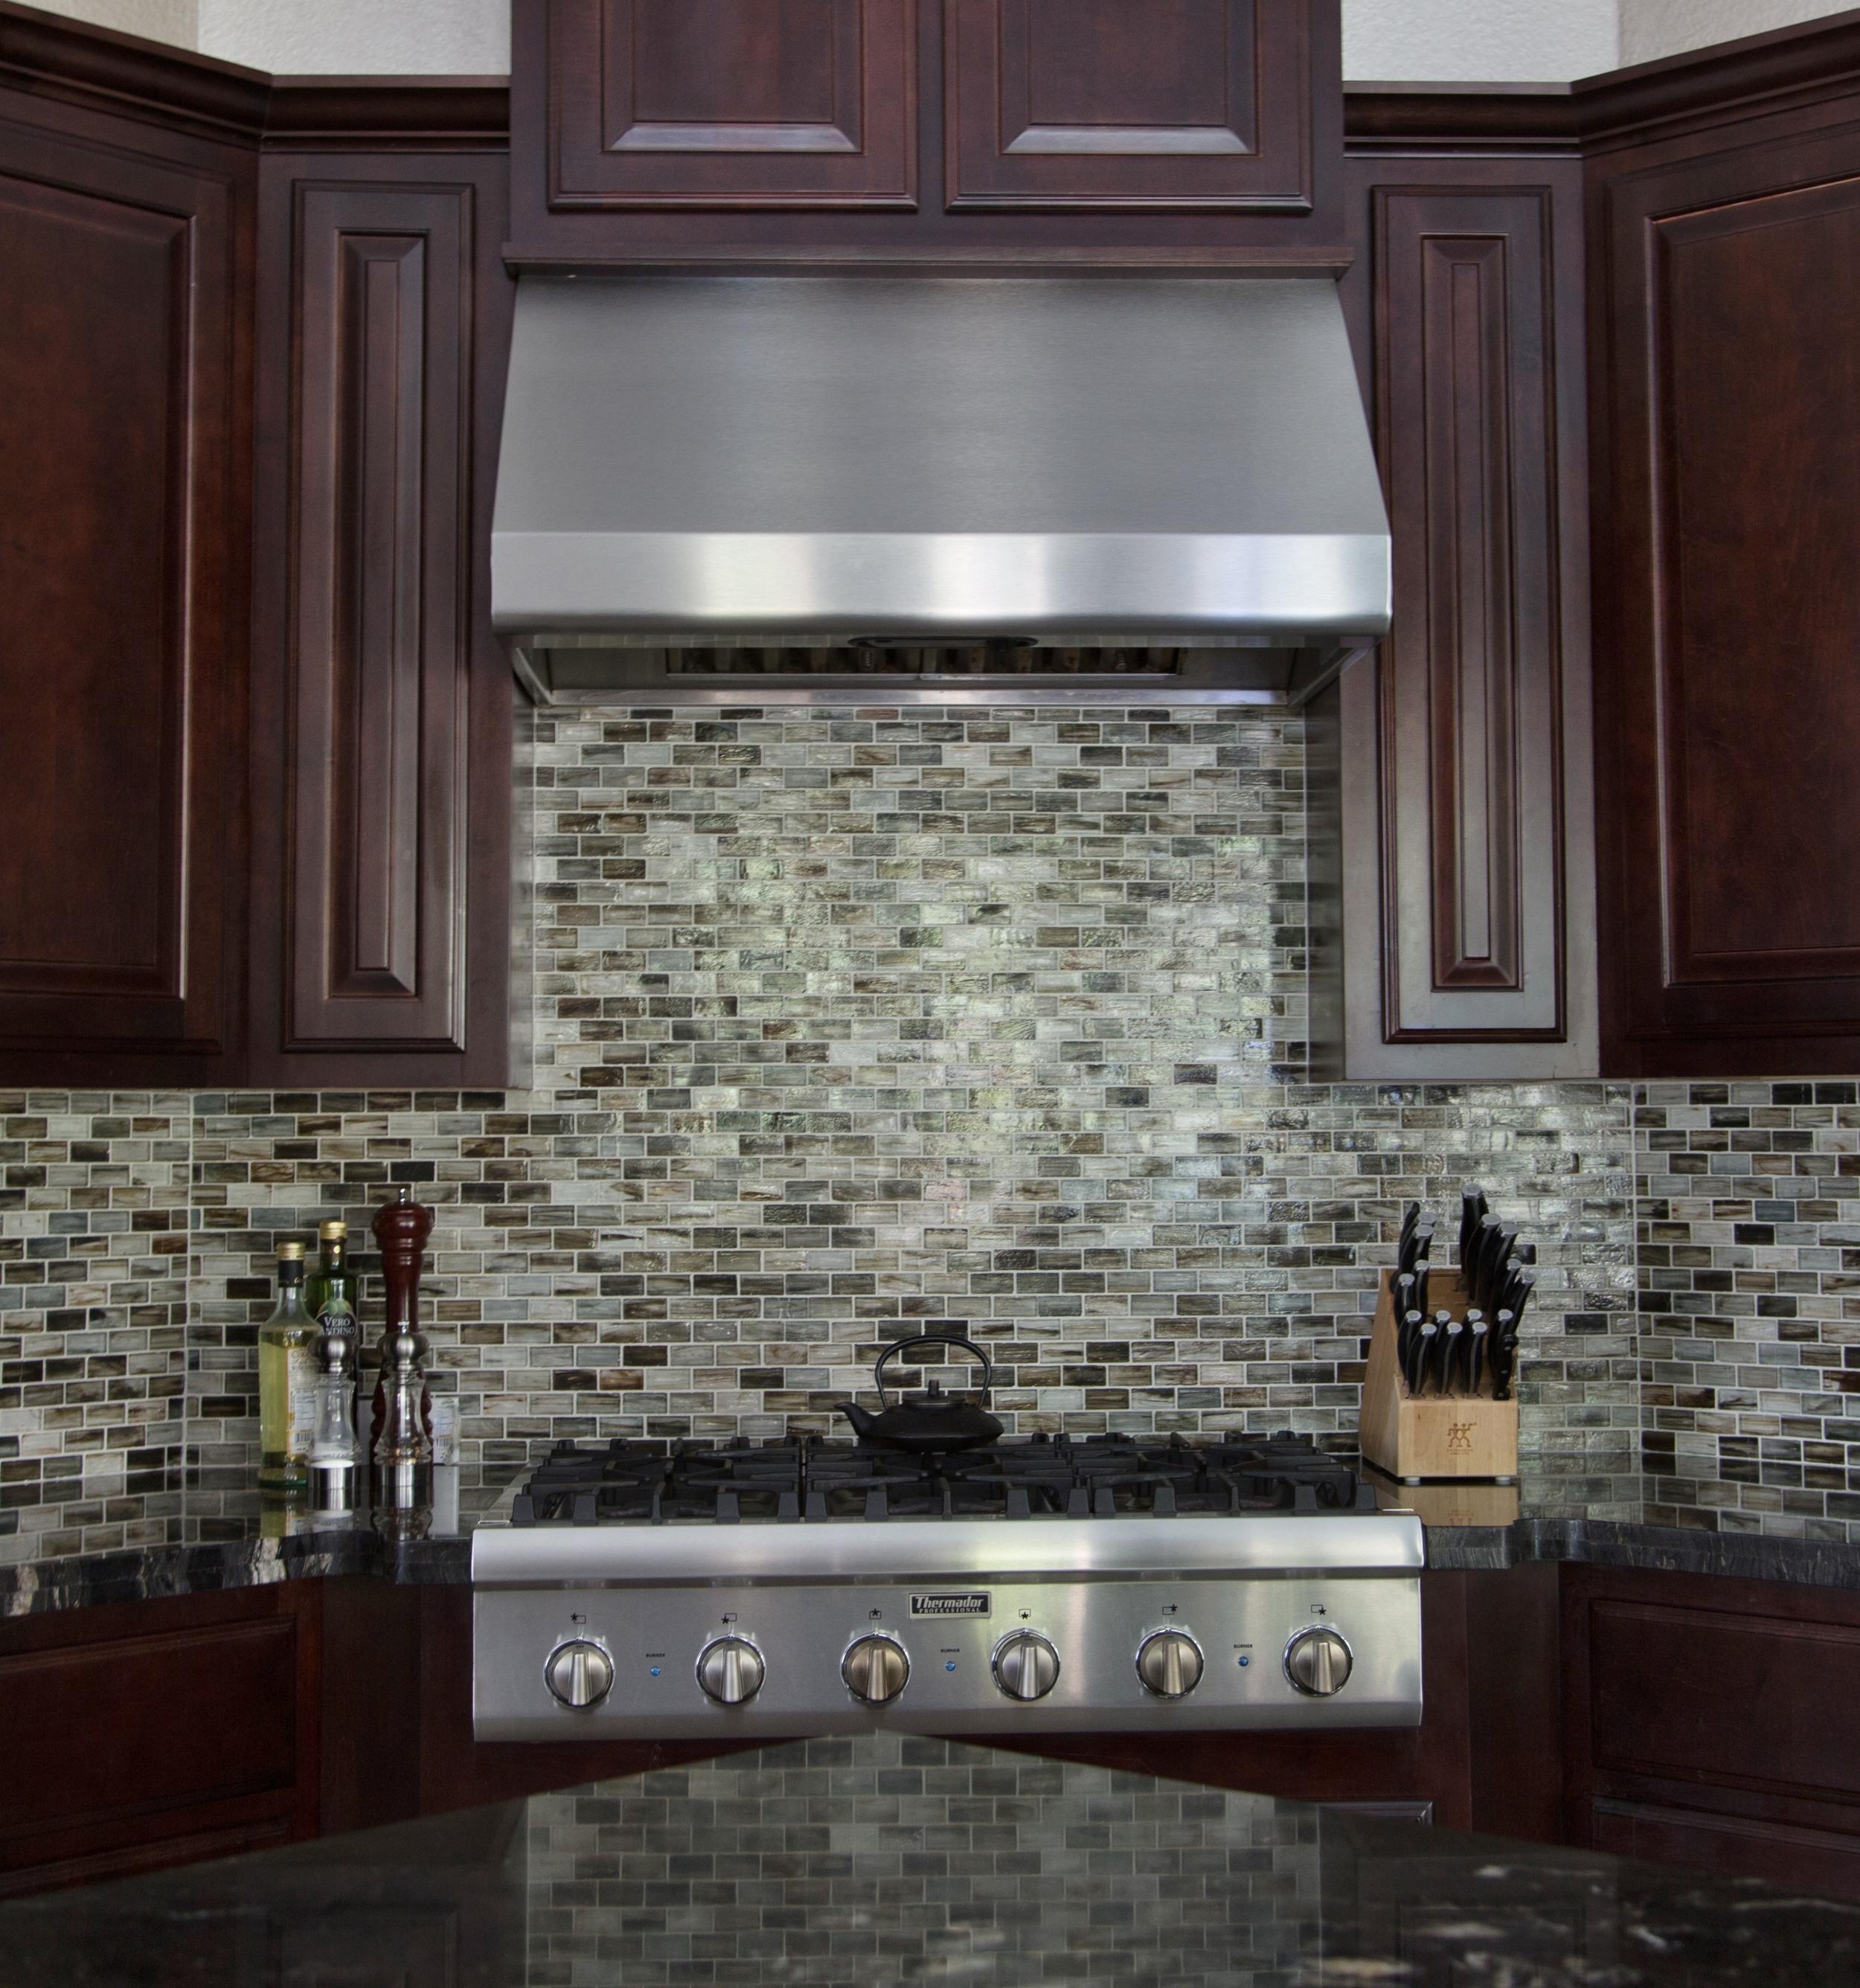 Dark, dramatic kitchen remodel by interior designer Carla Aston